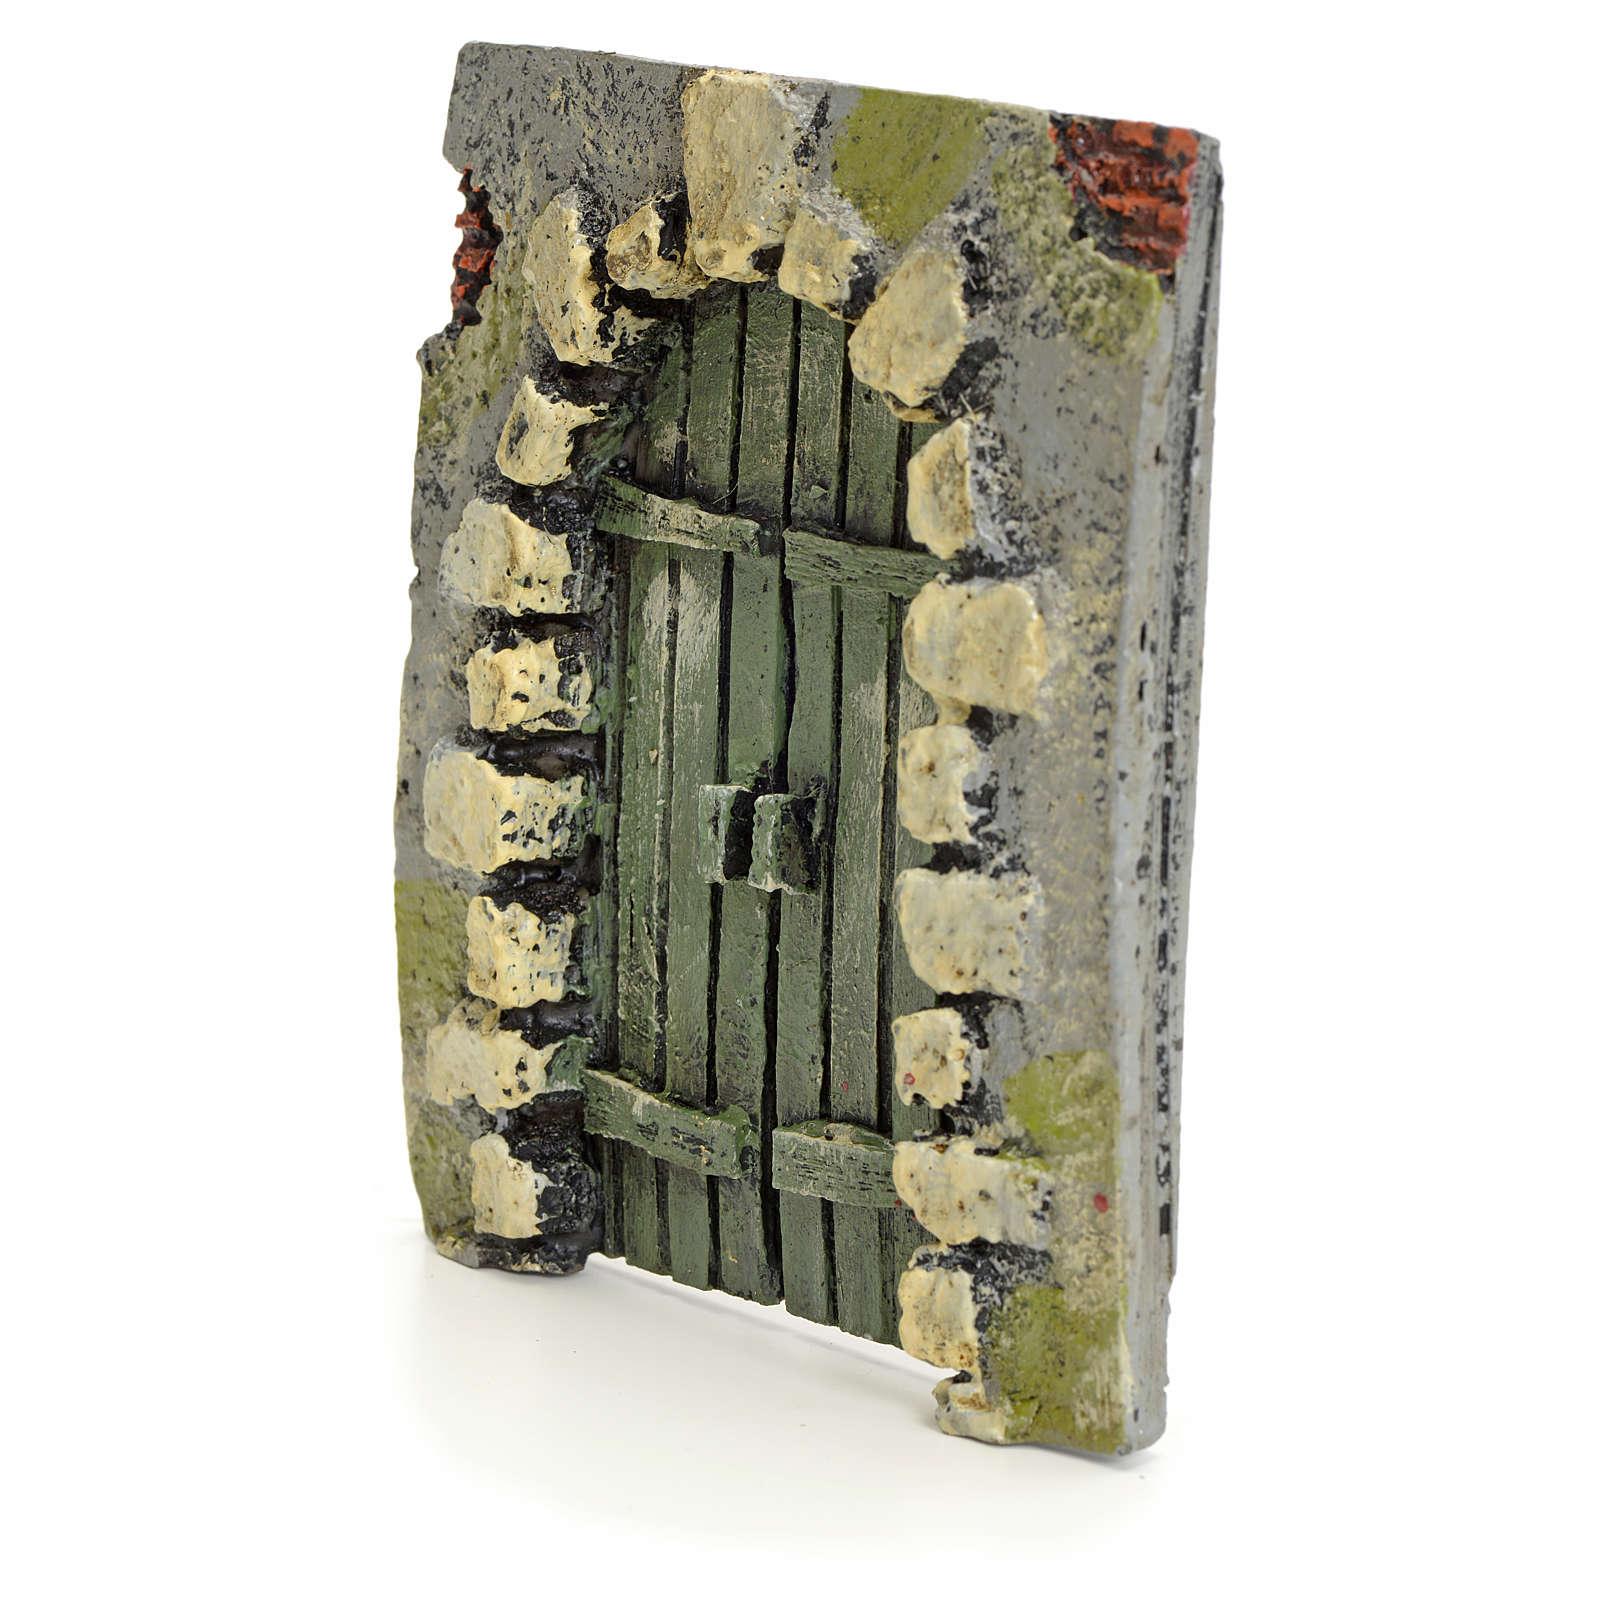 Nativity accessory, door in the rocks 11x10cm 4